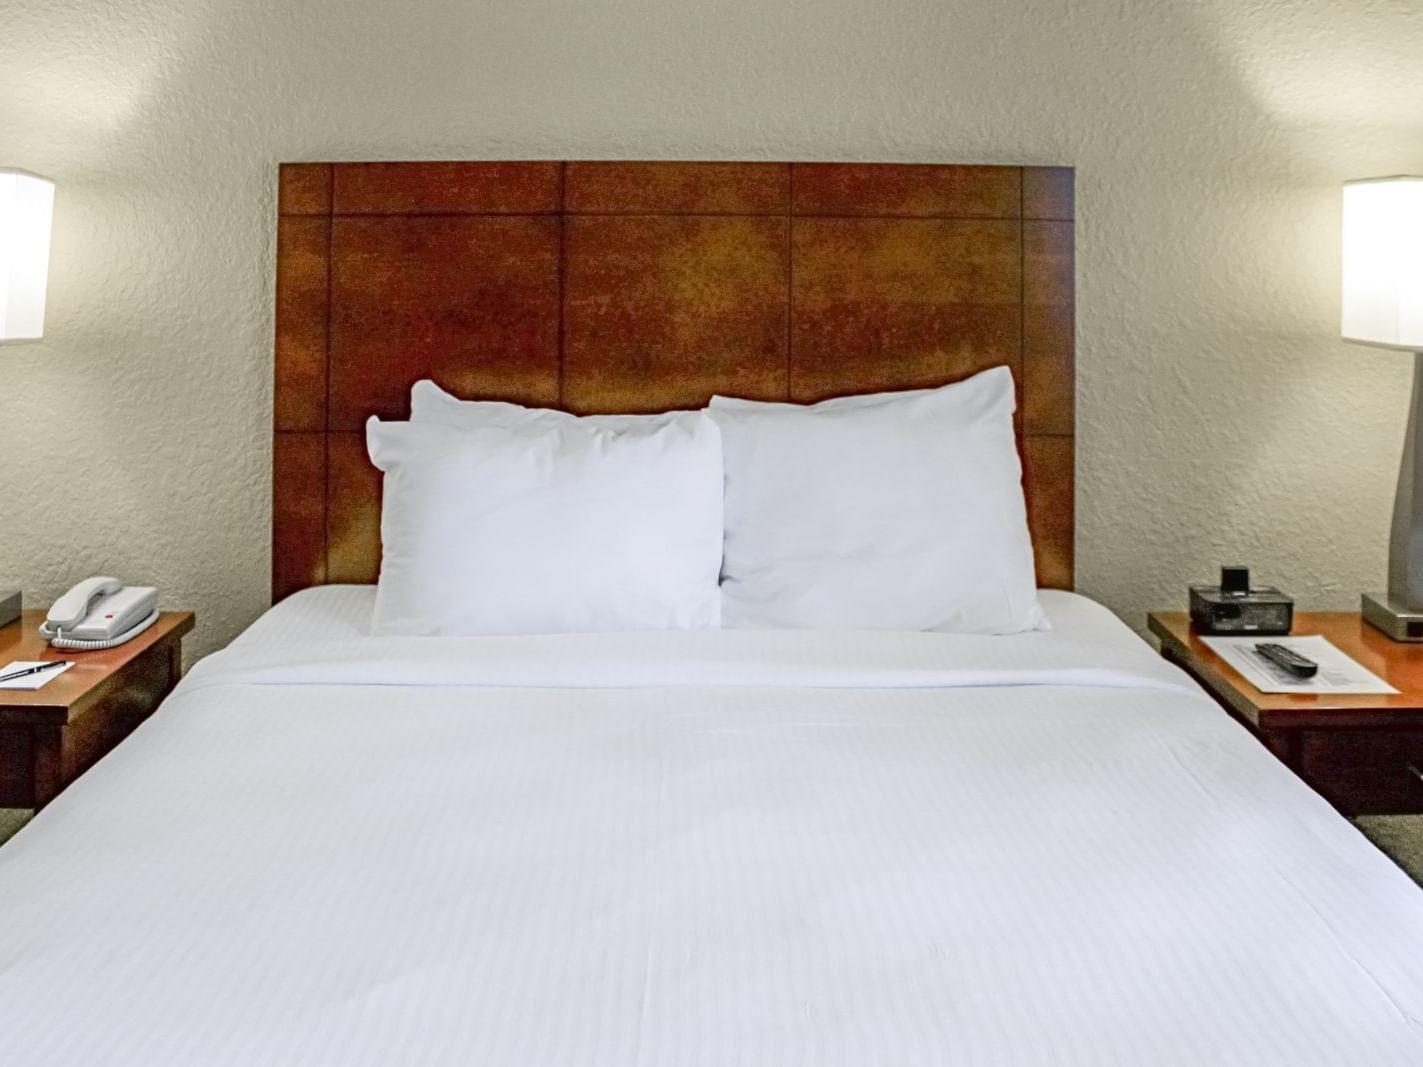 Studio Room with one bed at Mystic Dunes Resort